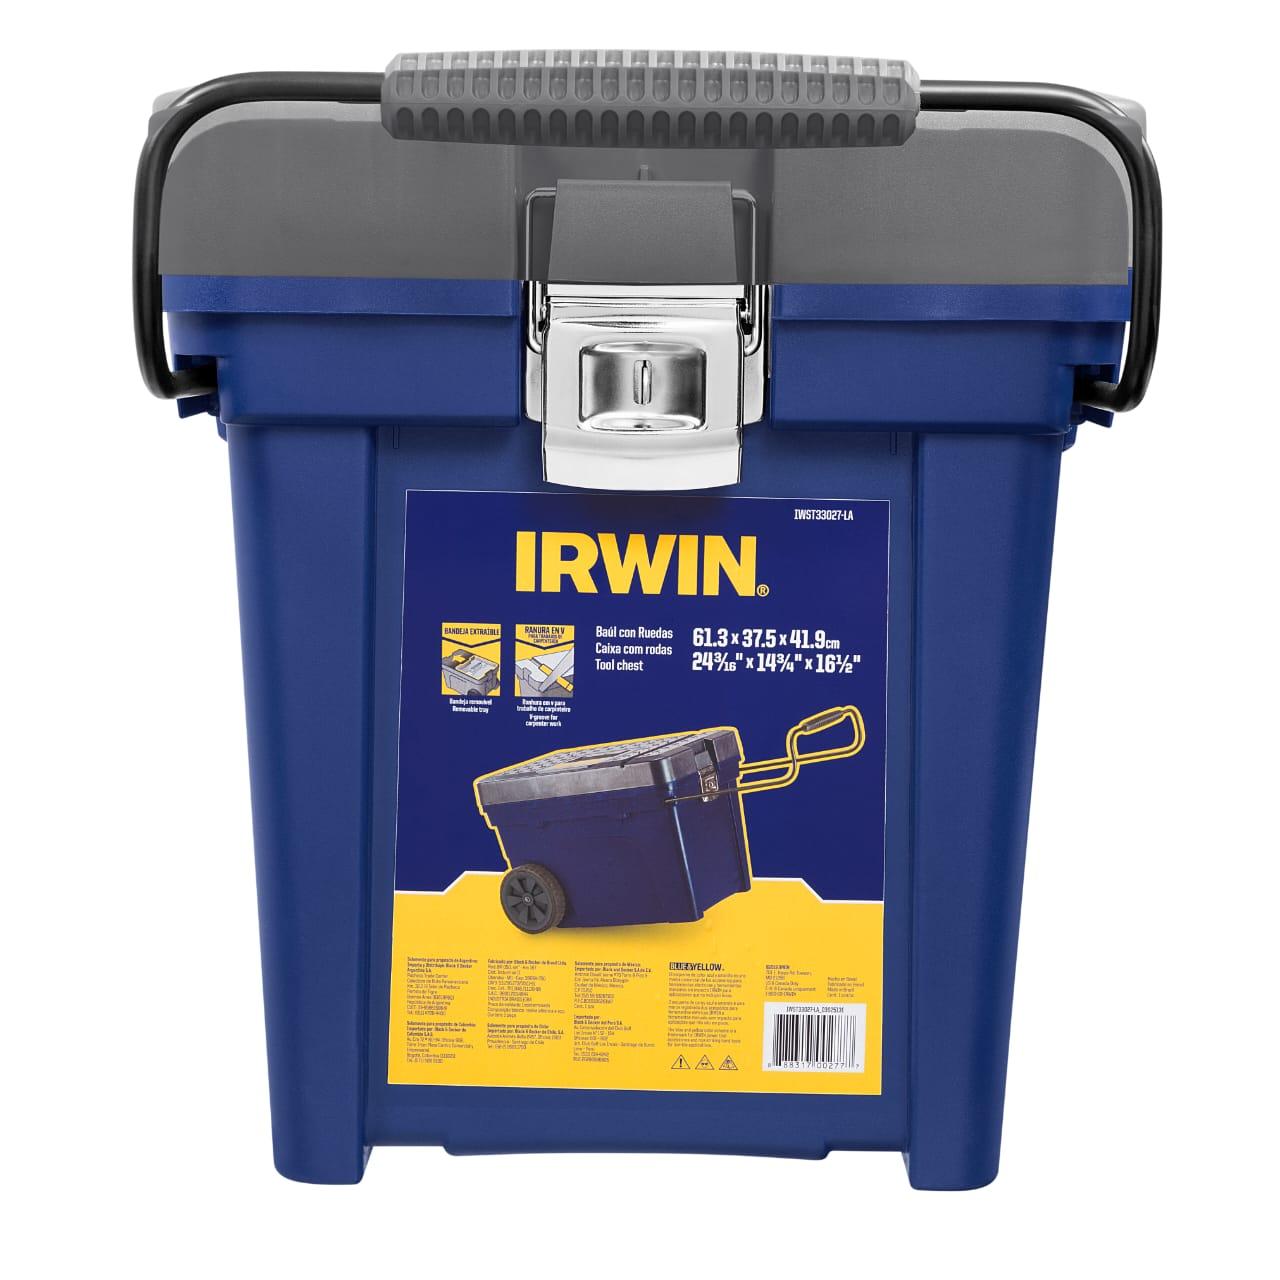 Caixa Baú Ferramentas com Rodas Contractor IWST33027-LA Irwin